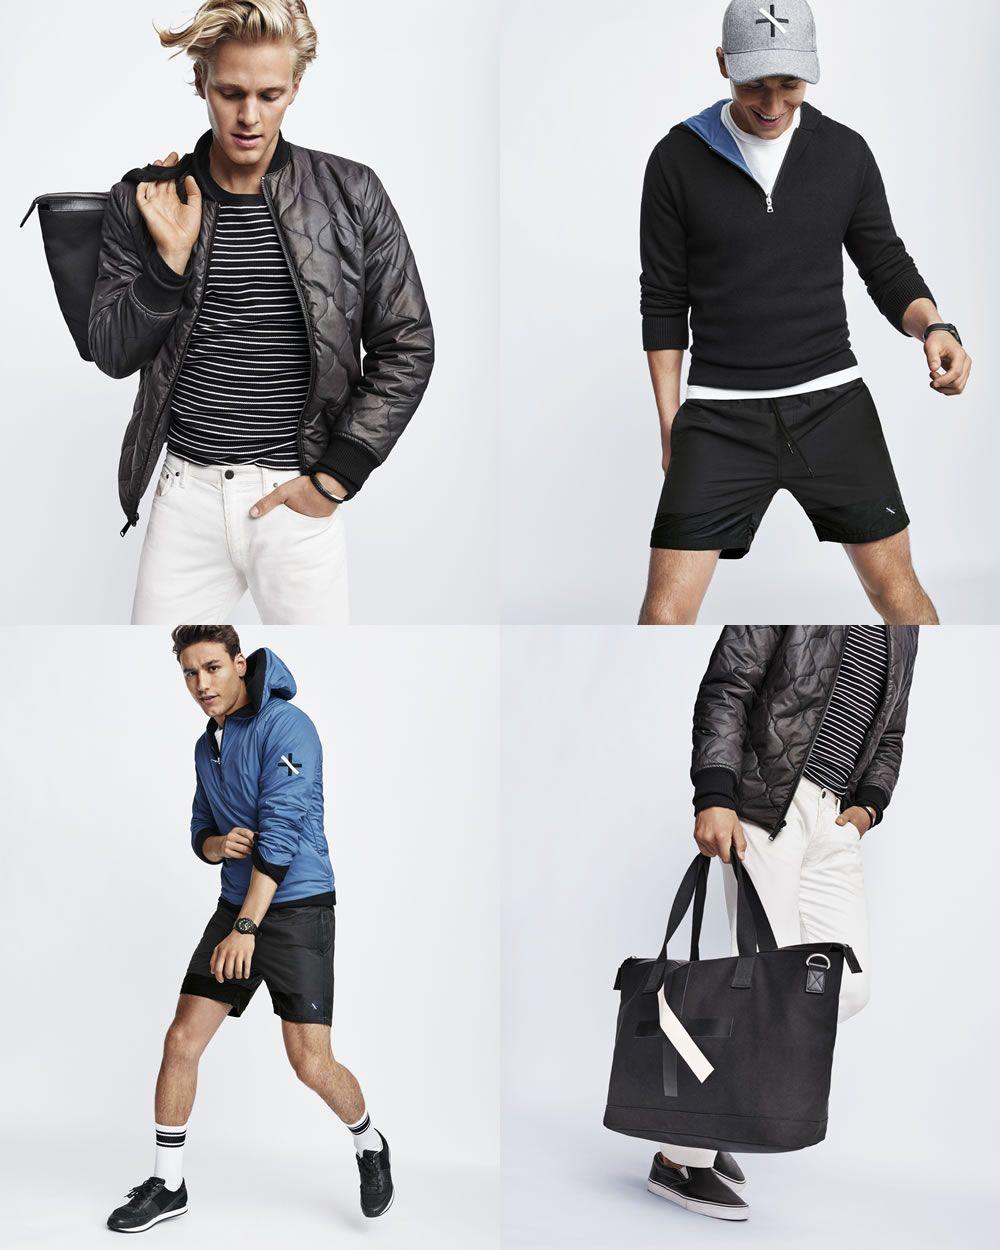 Gap X GQ: Best New Menswear Designers In America 2019 recommendations